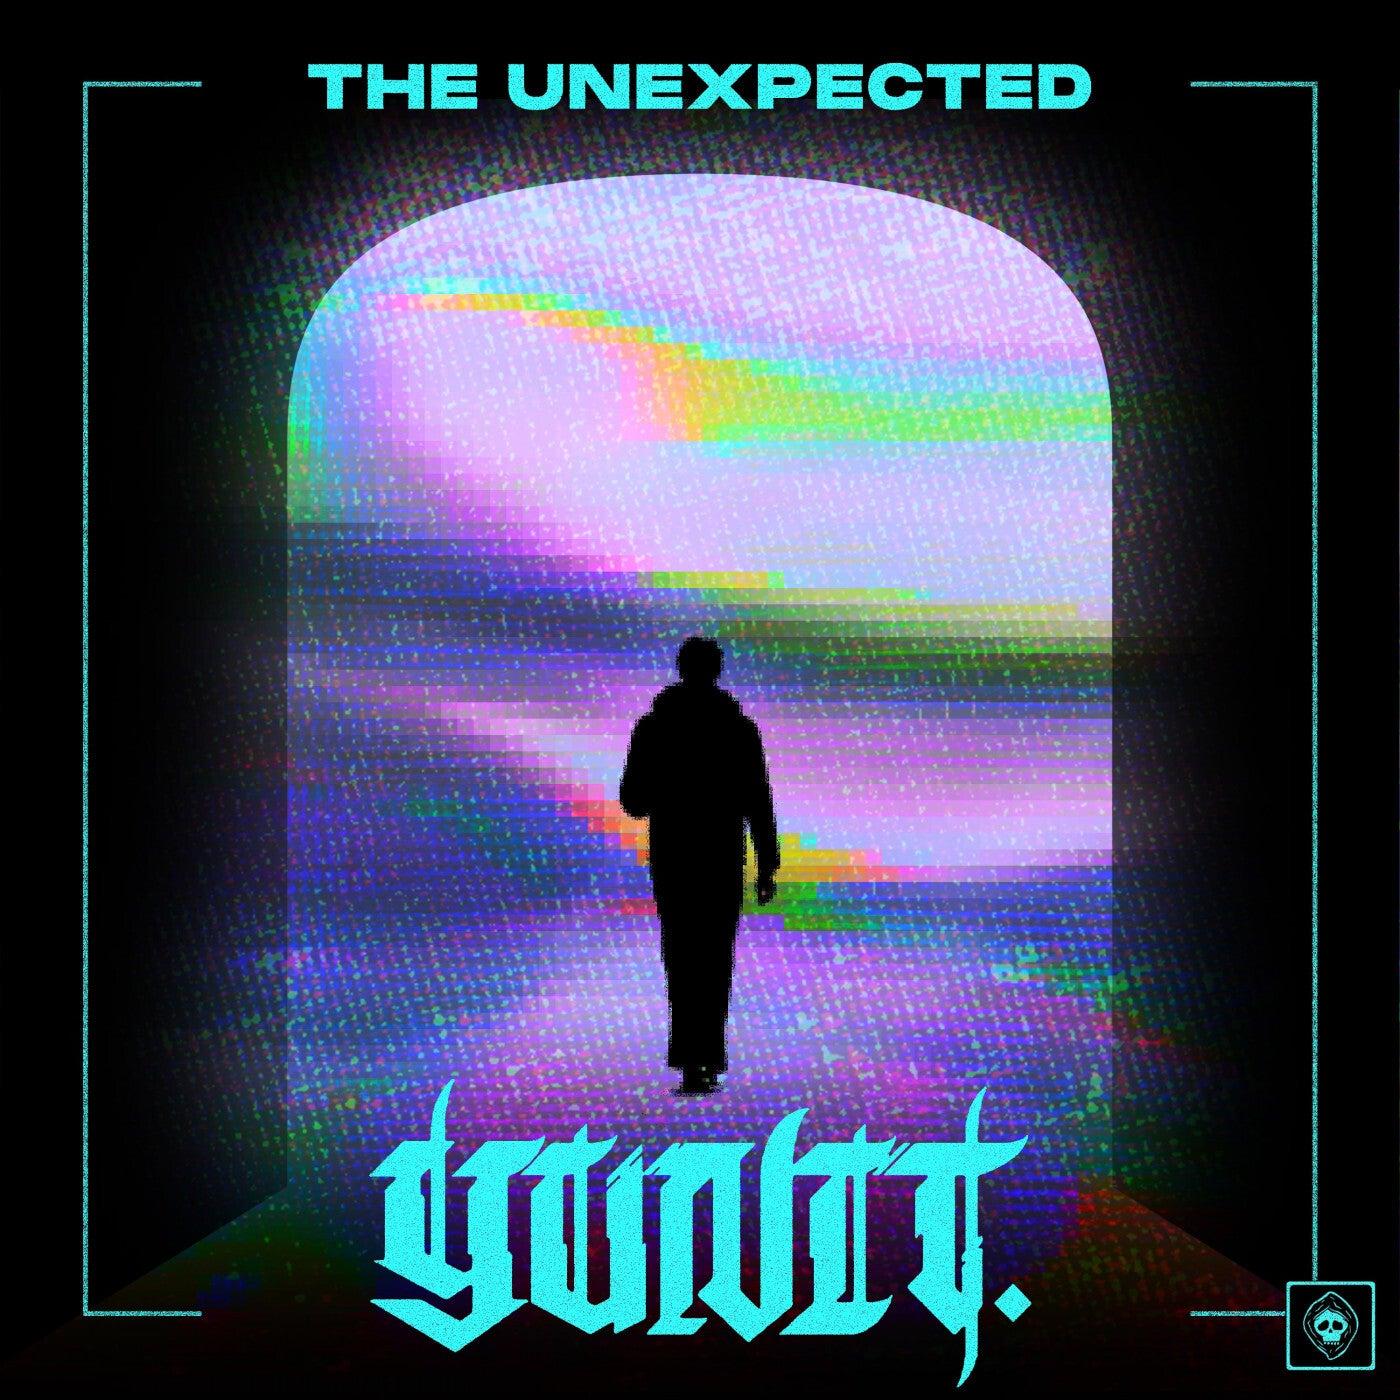 Unexpected (Original Mix)